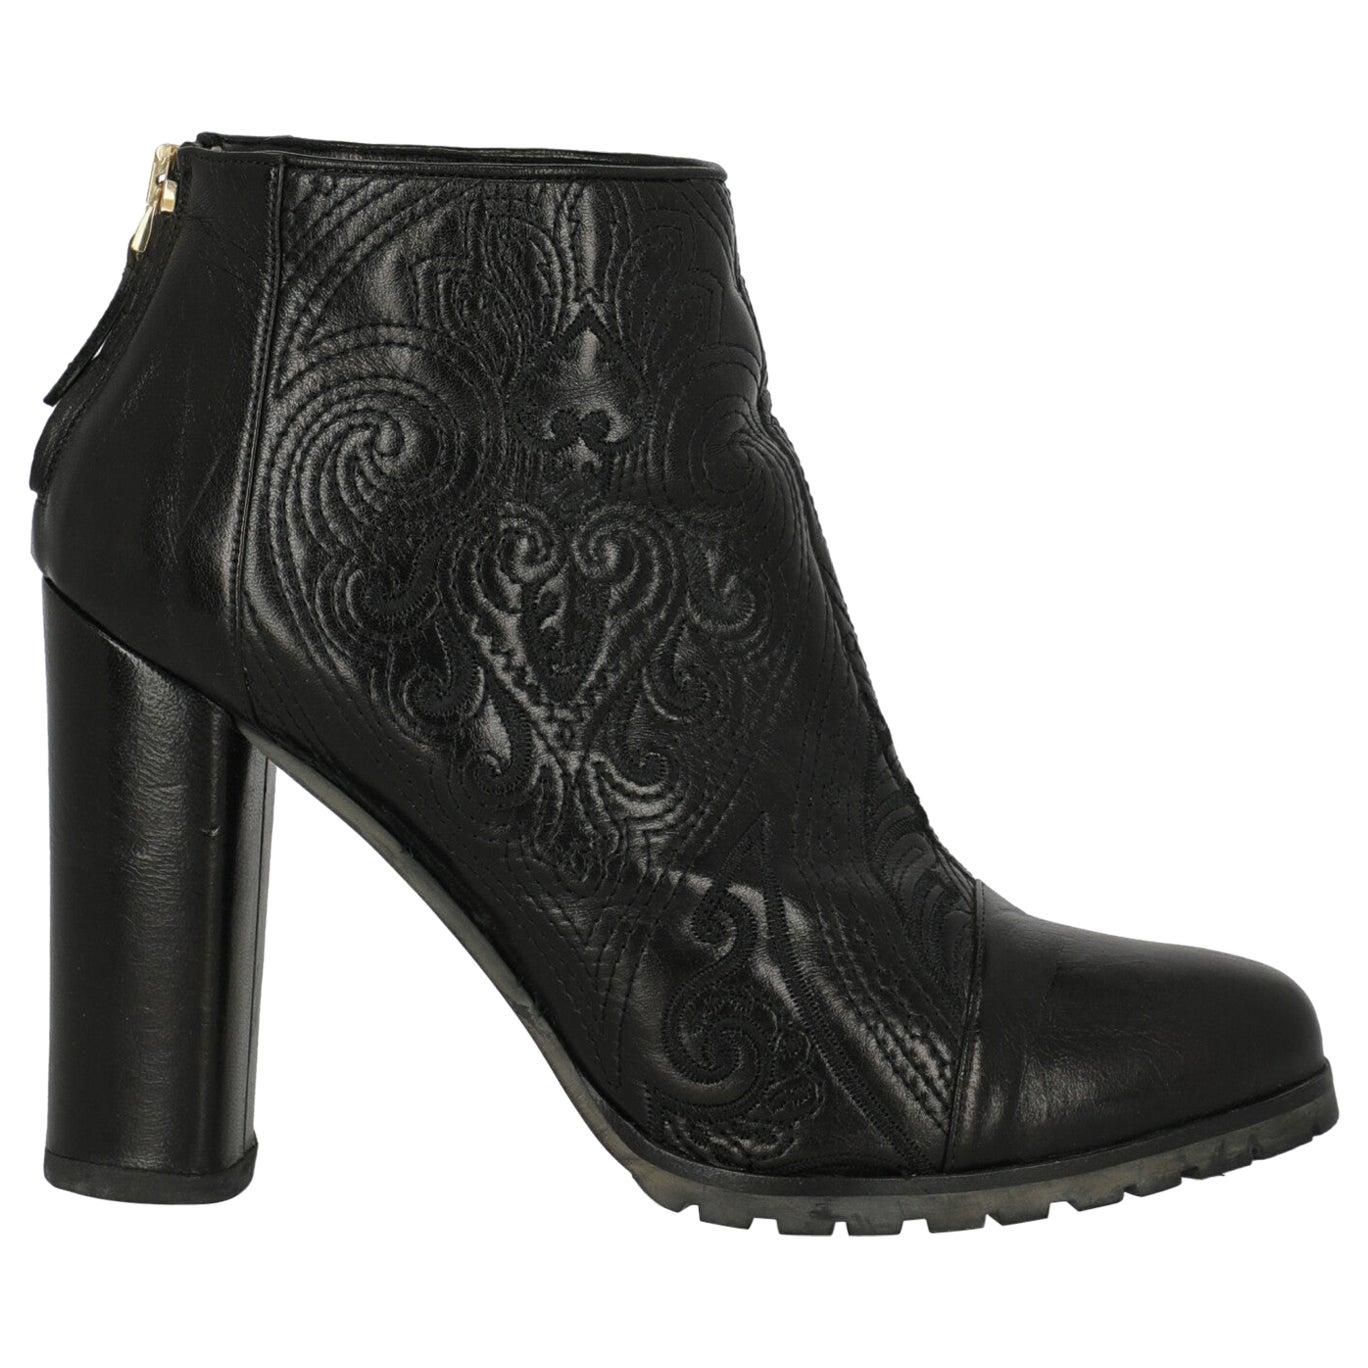 Etro Women Ankle boots Black Leather EU 40.5